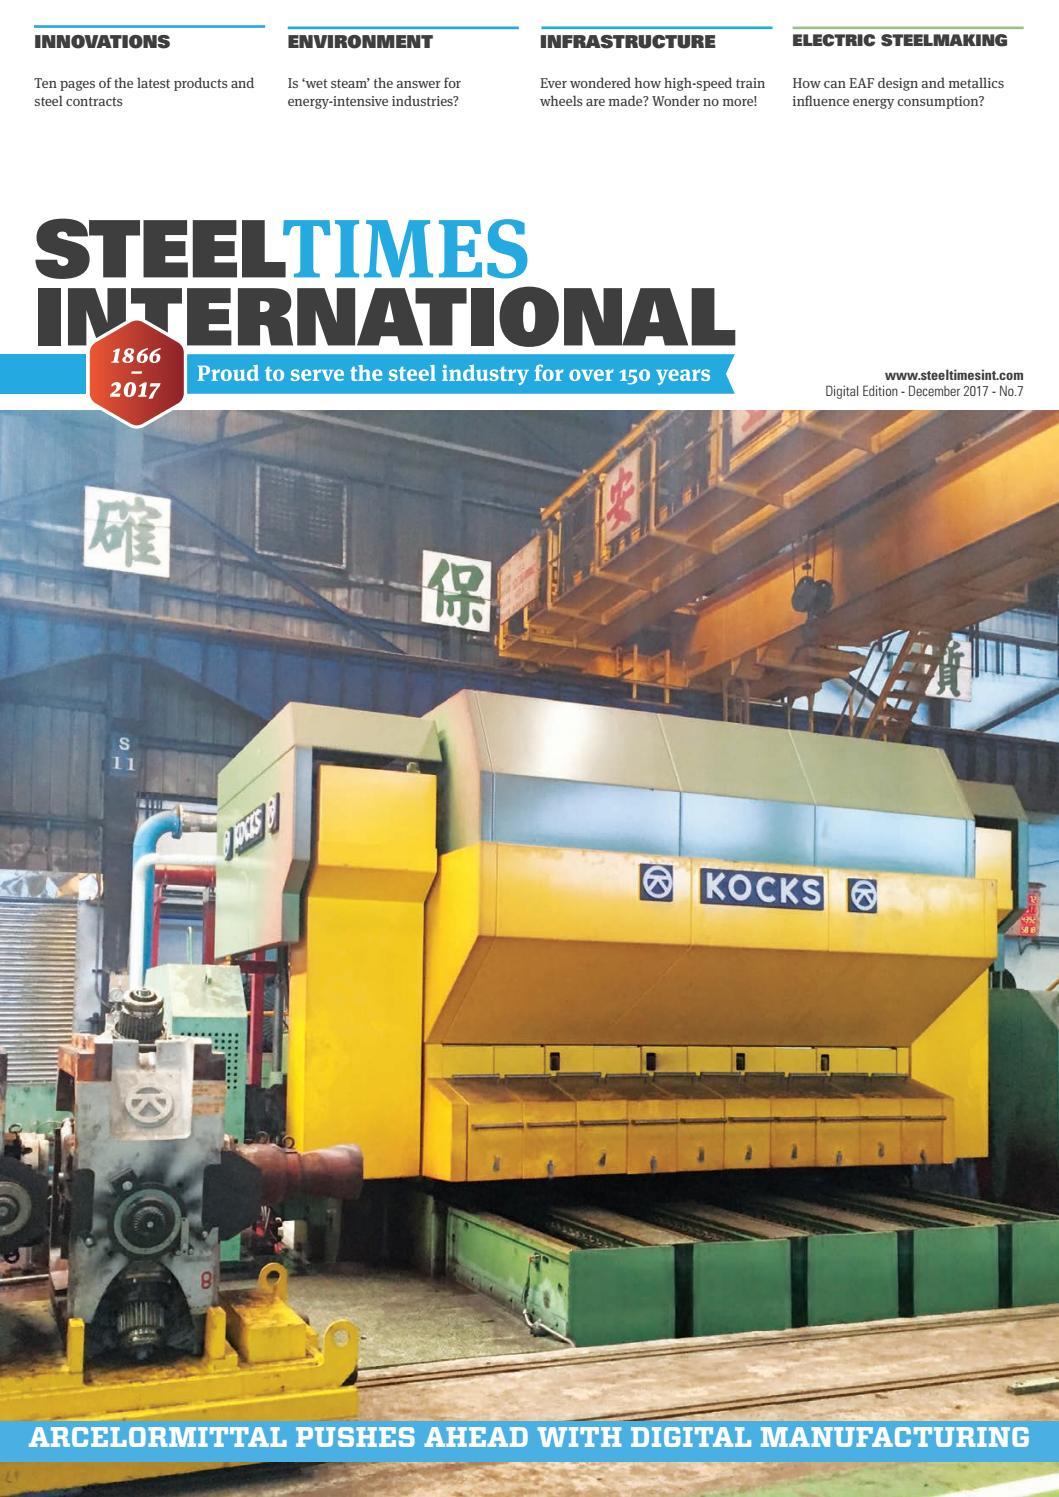 Steel Times International Digital December 2017 by Quartz